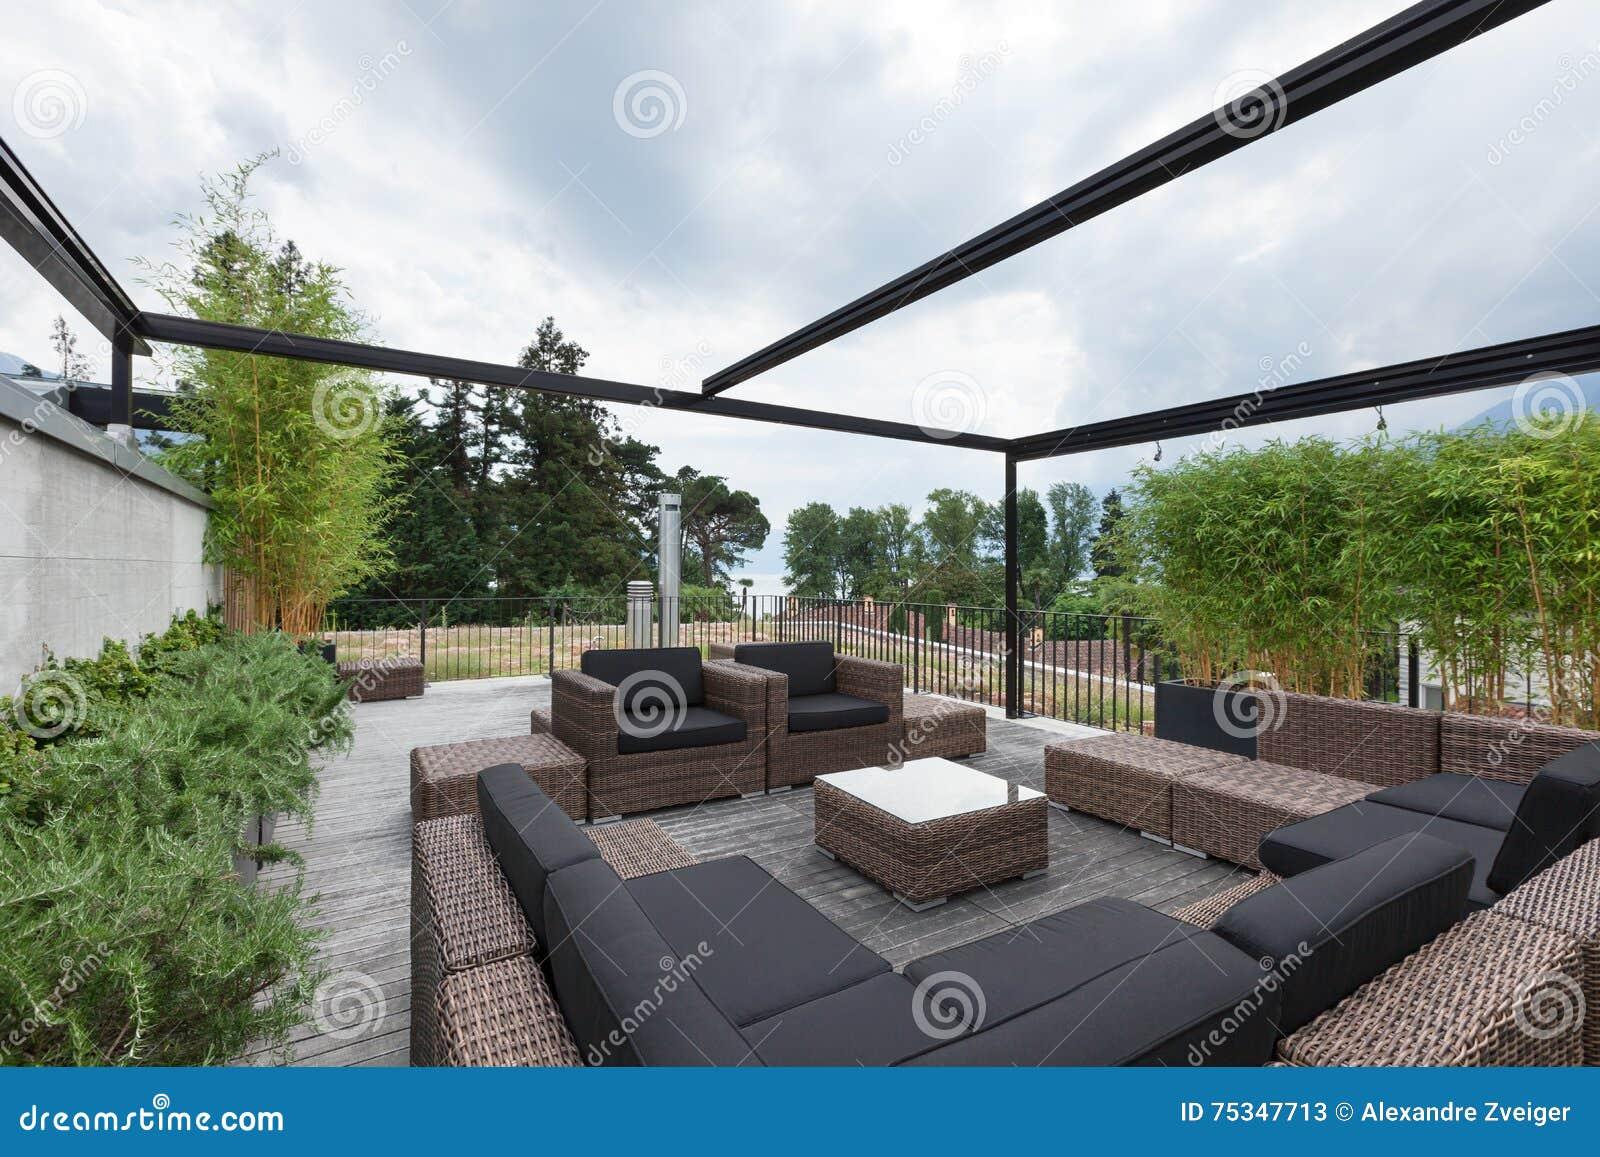 Patio With Comfortable Garden Furniture Stock Photo Image  75347713. Comfortable Garden Furniture   Zandalus net